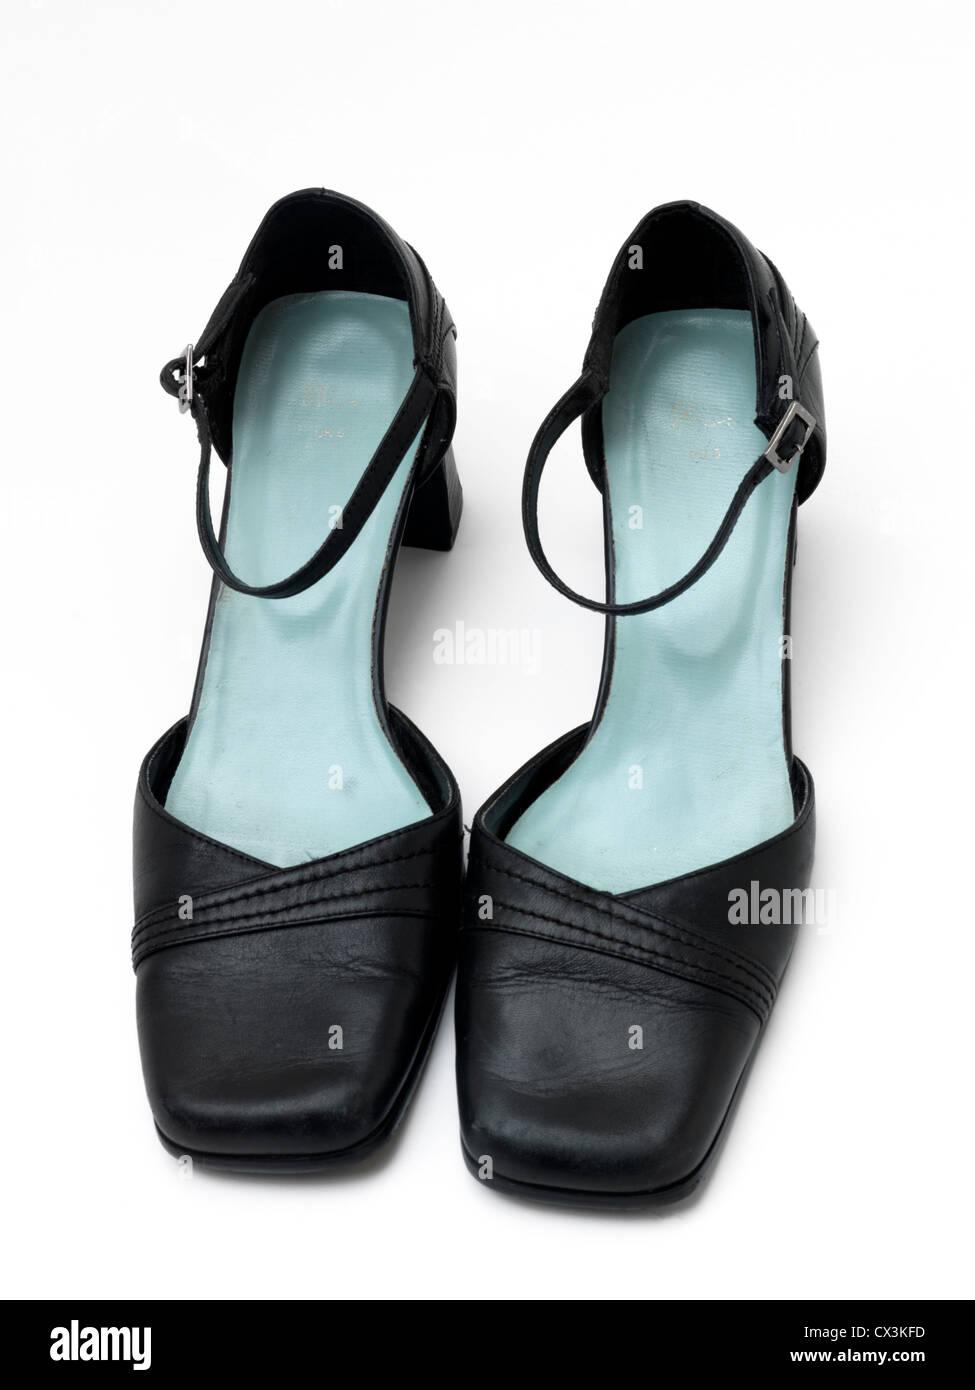 f214b2d92d27 Black Heel Shoes Stockfotos   Black Heel Shoes Bilder - Alamy